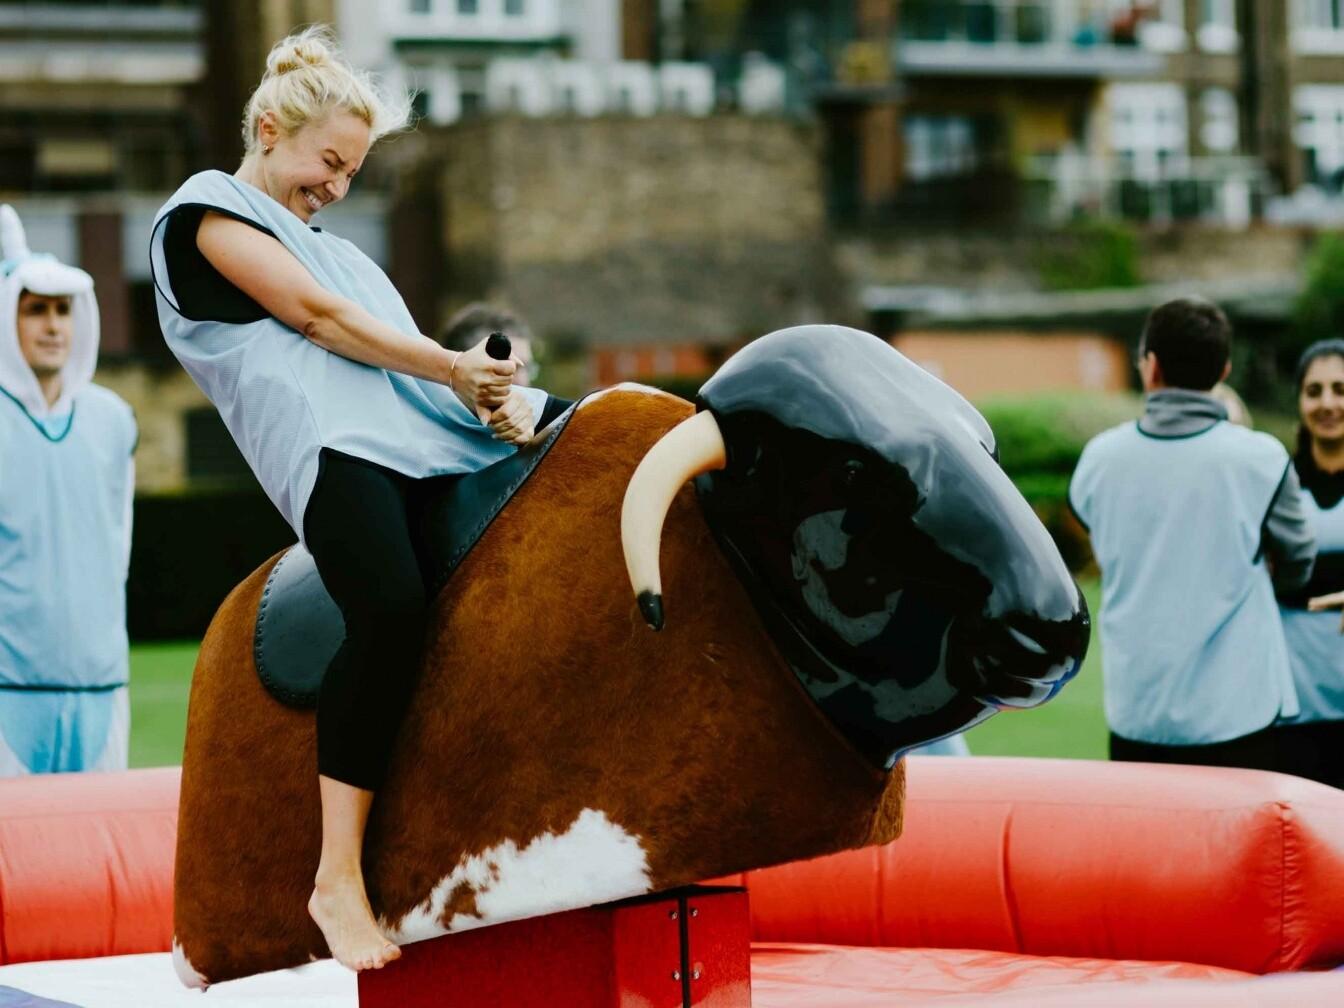 Saffery_Rodeo Bull 3